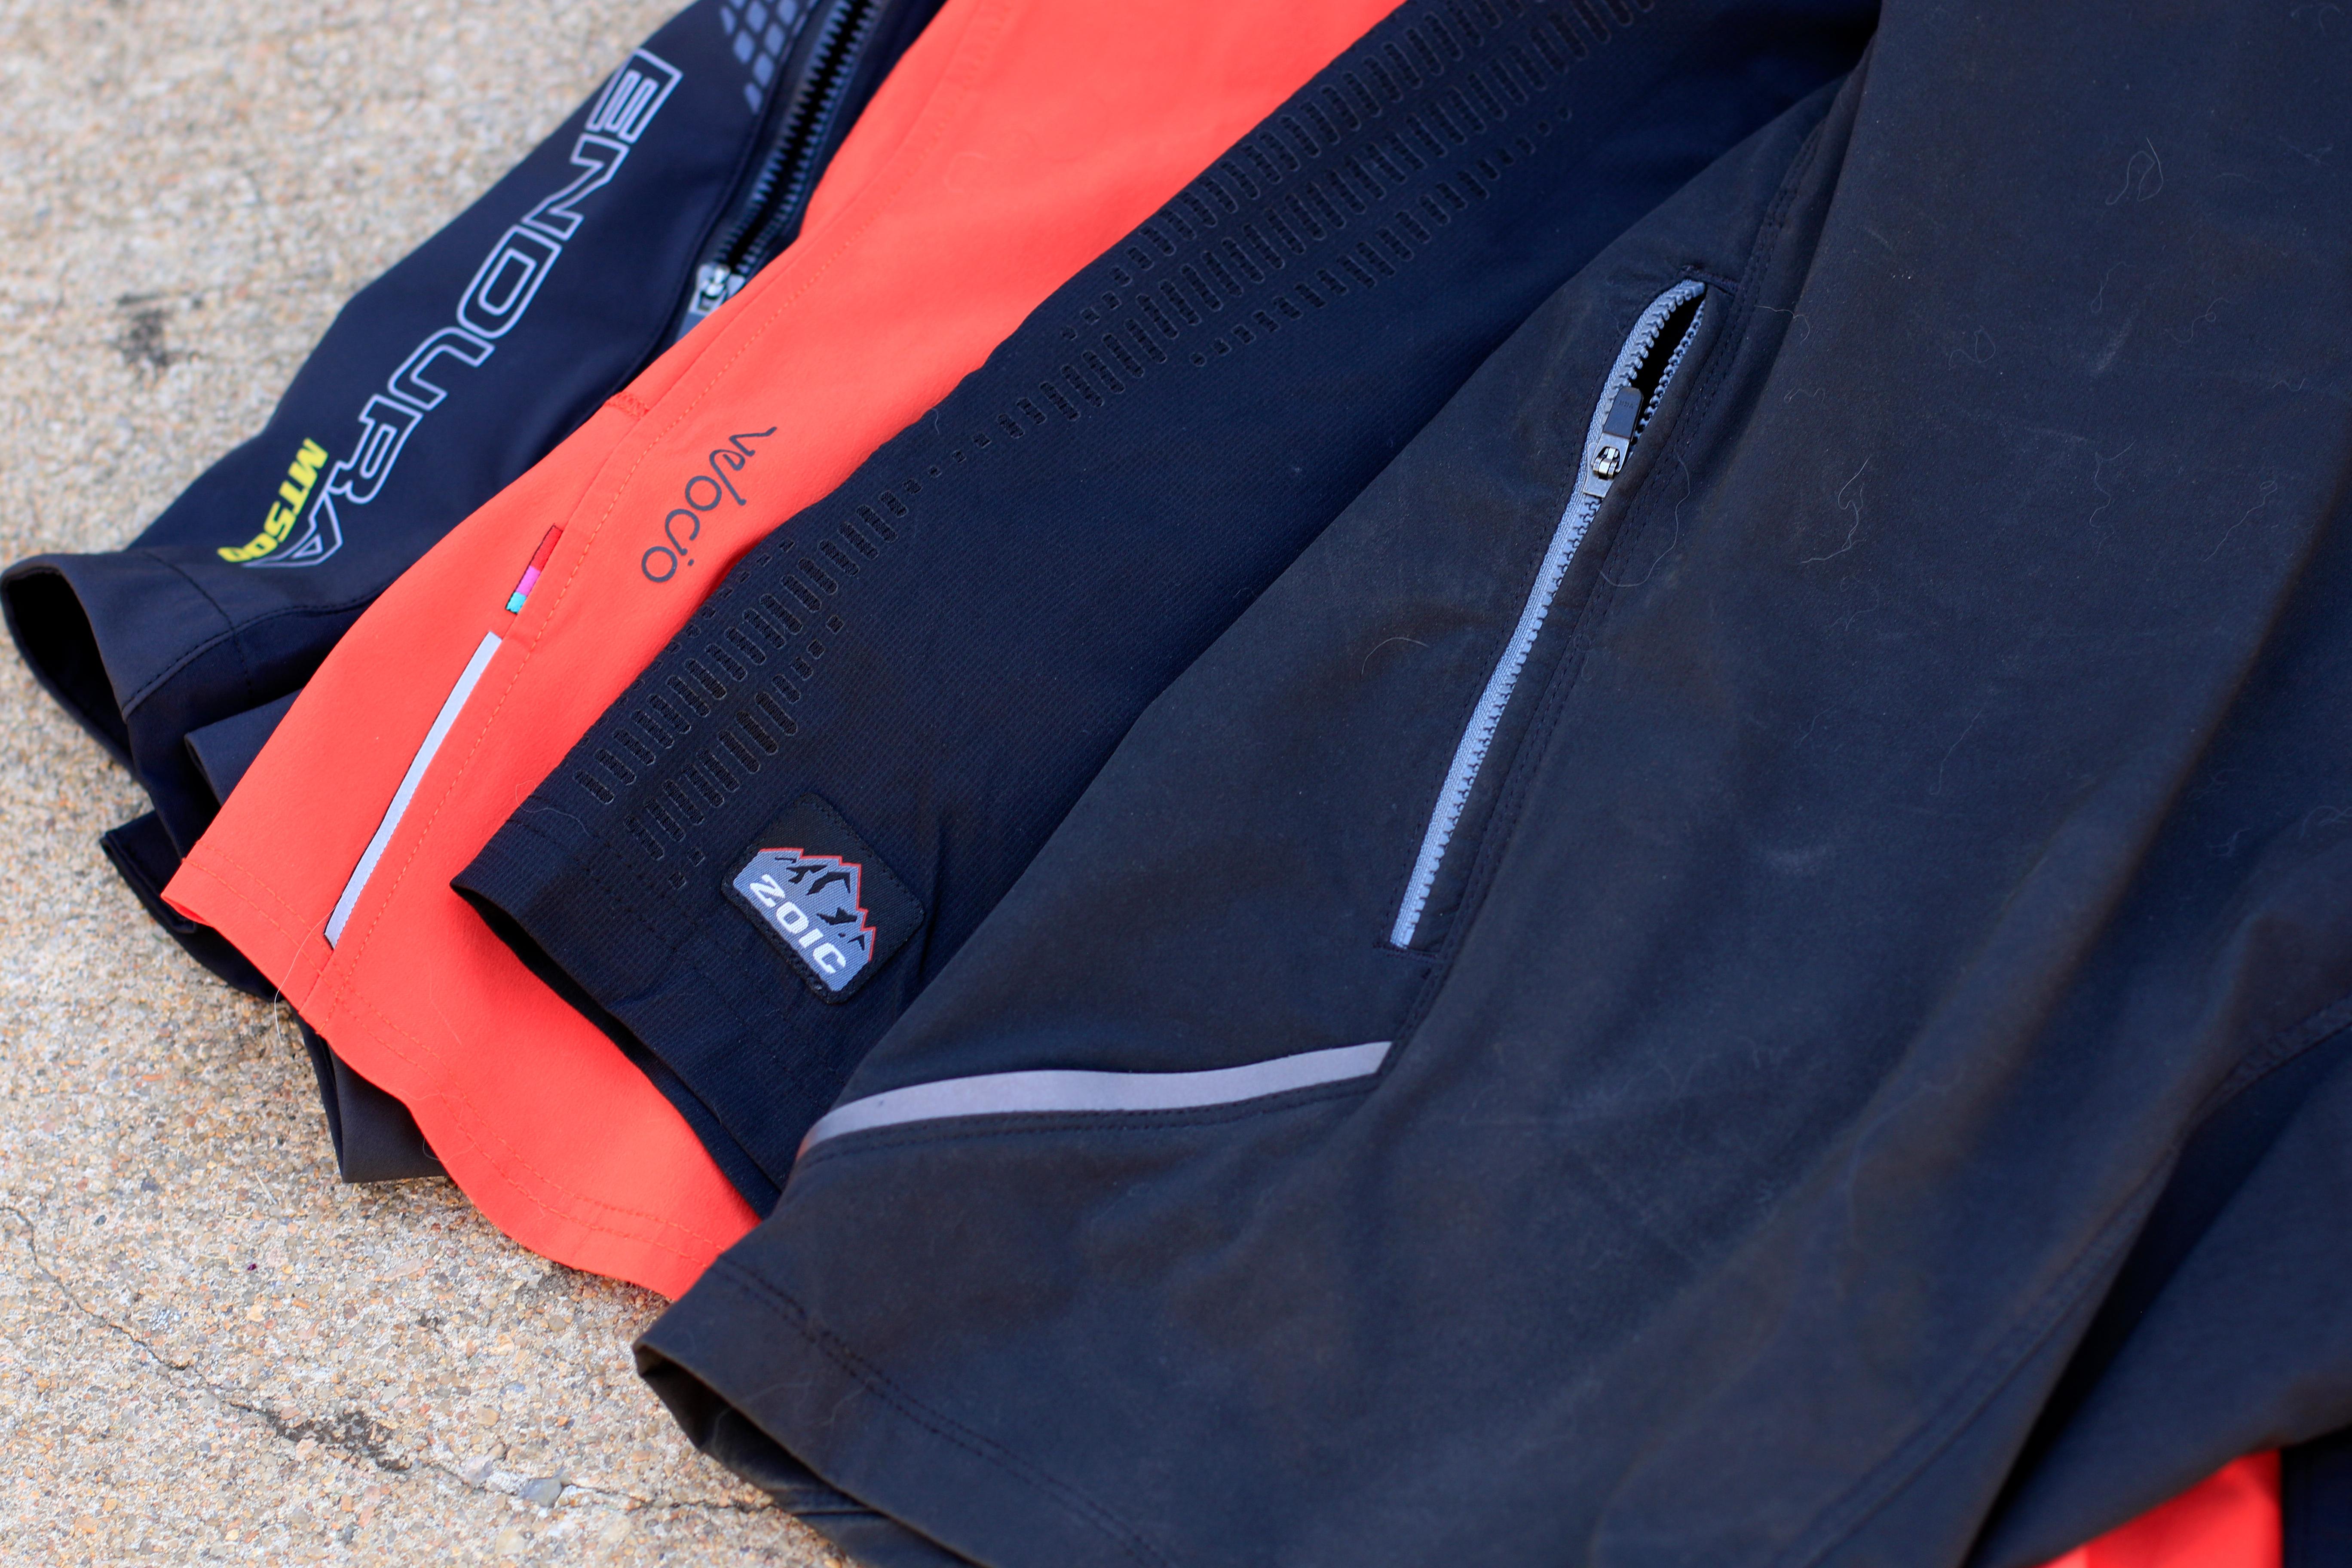 From Slim to Baggy: A Mountain Bike Shorts Review Roundup - Singletracks Mountain Bike News